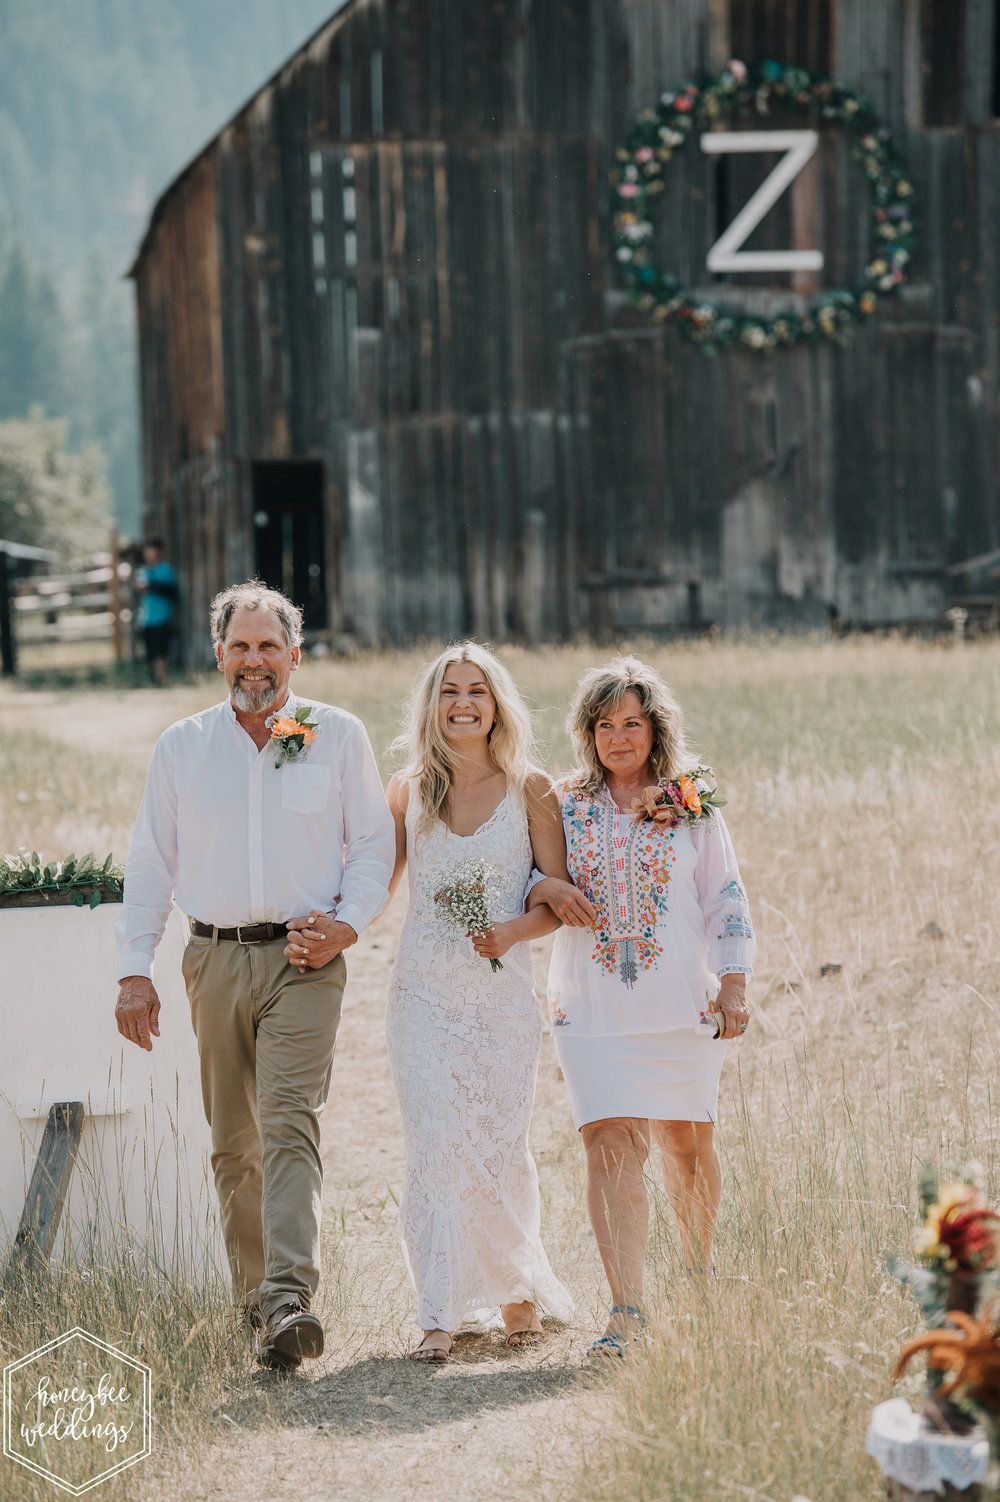 0344Alberton Wedding_Montana Wedding Photographer_Anneliesa Bashaw + Wyatt Zeylawy_August 11, 2018-216.jpg